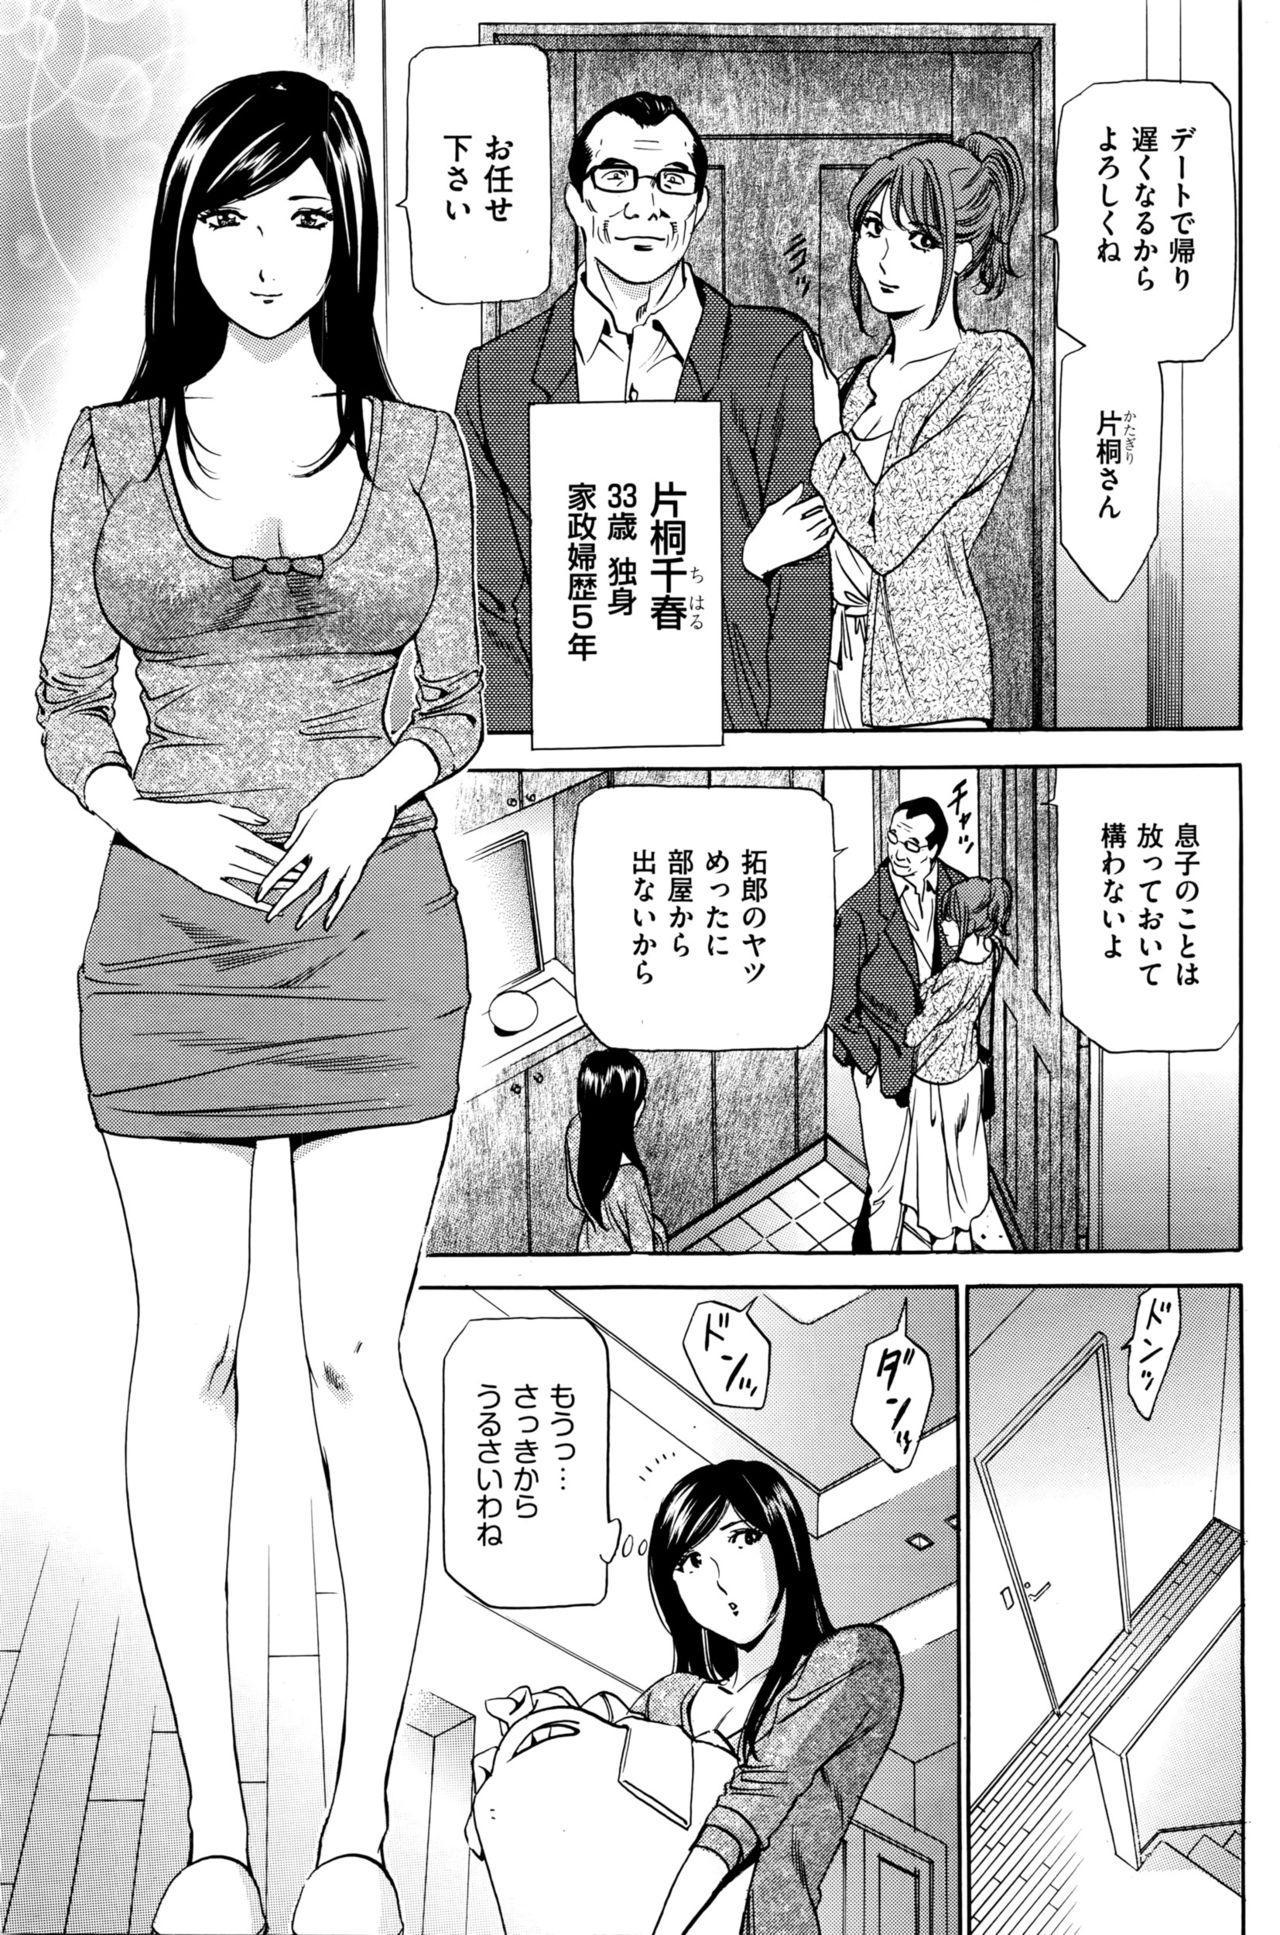 Wa Usuki Ipa a 1-10 21